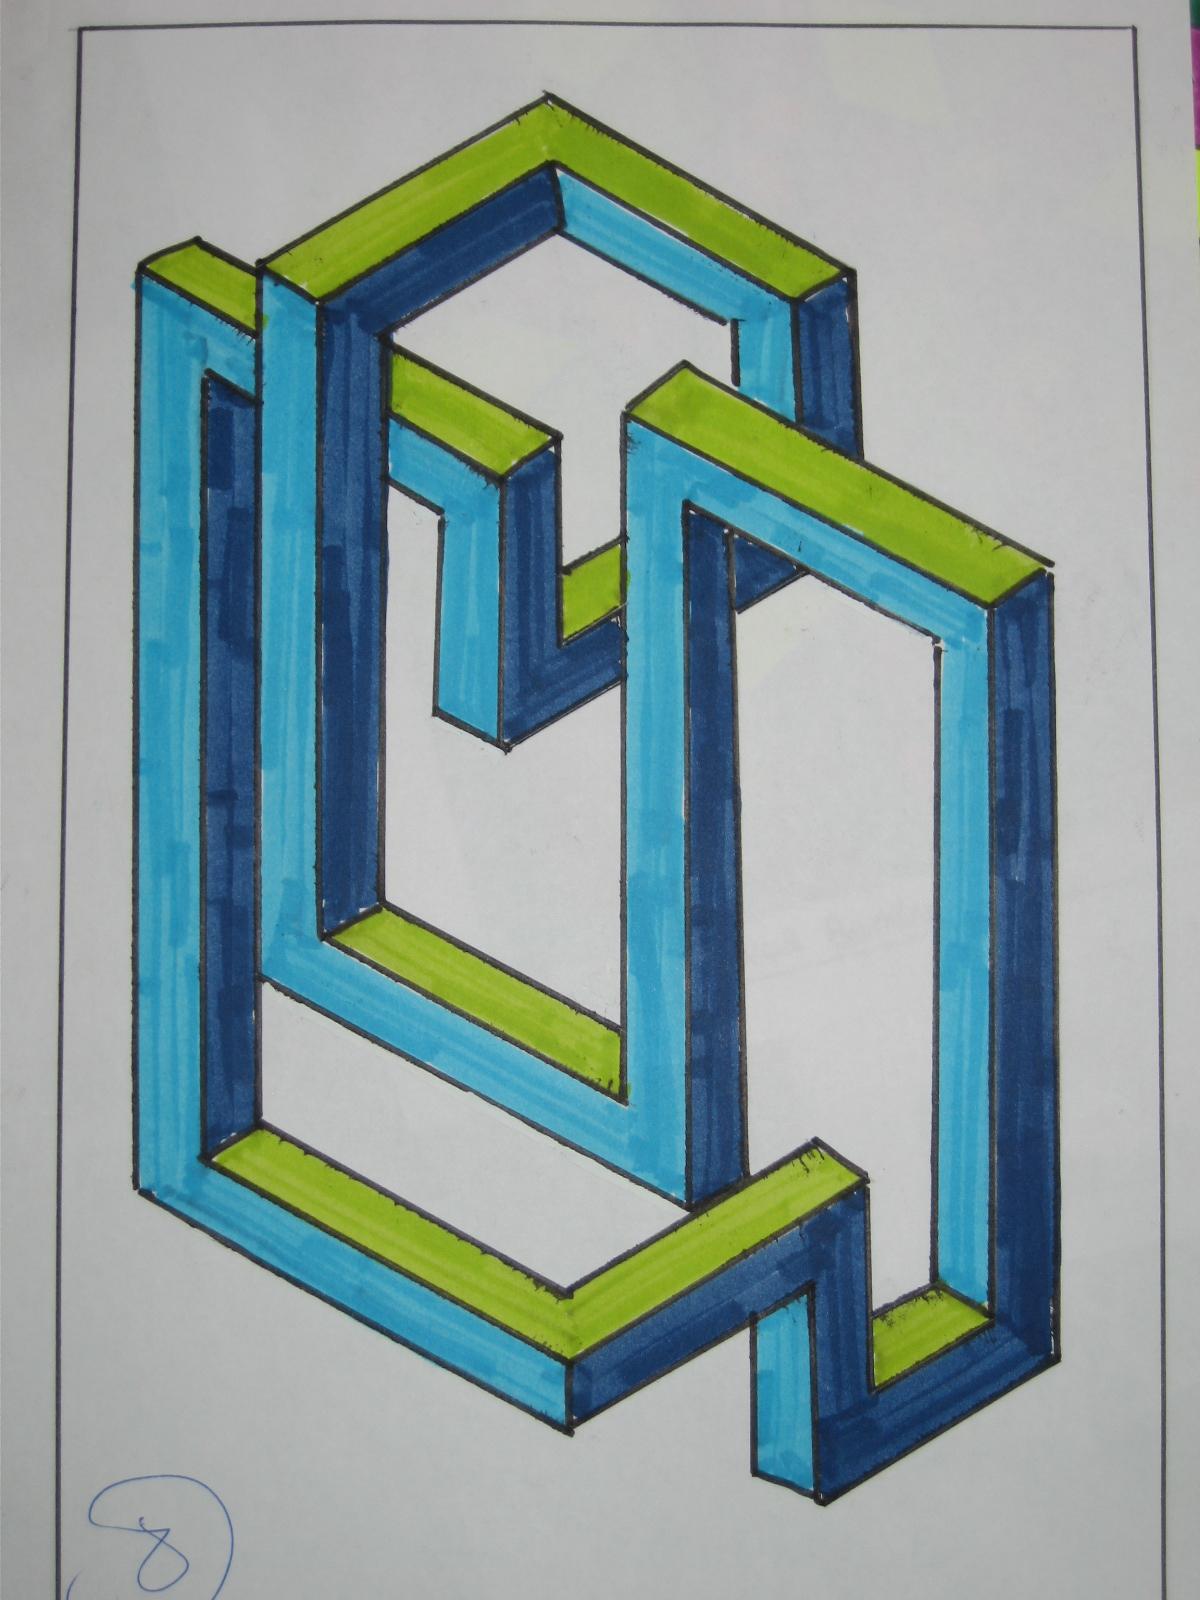 Okuda delimbo gallery arte urbano graffiti figuras - Figuras geometricas imposibles ...